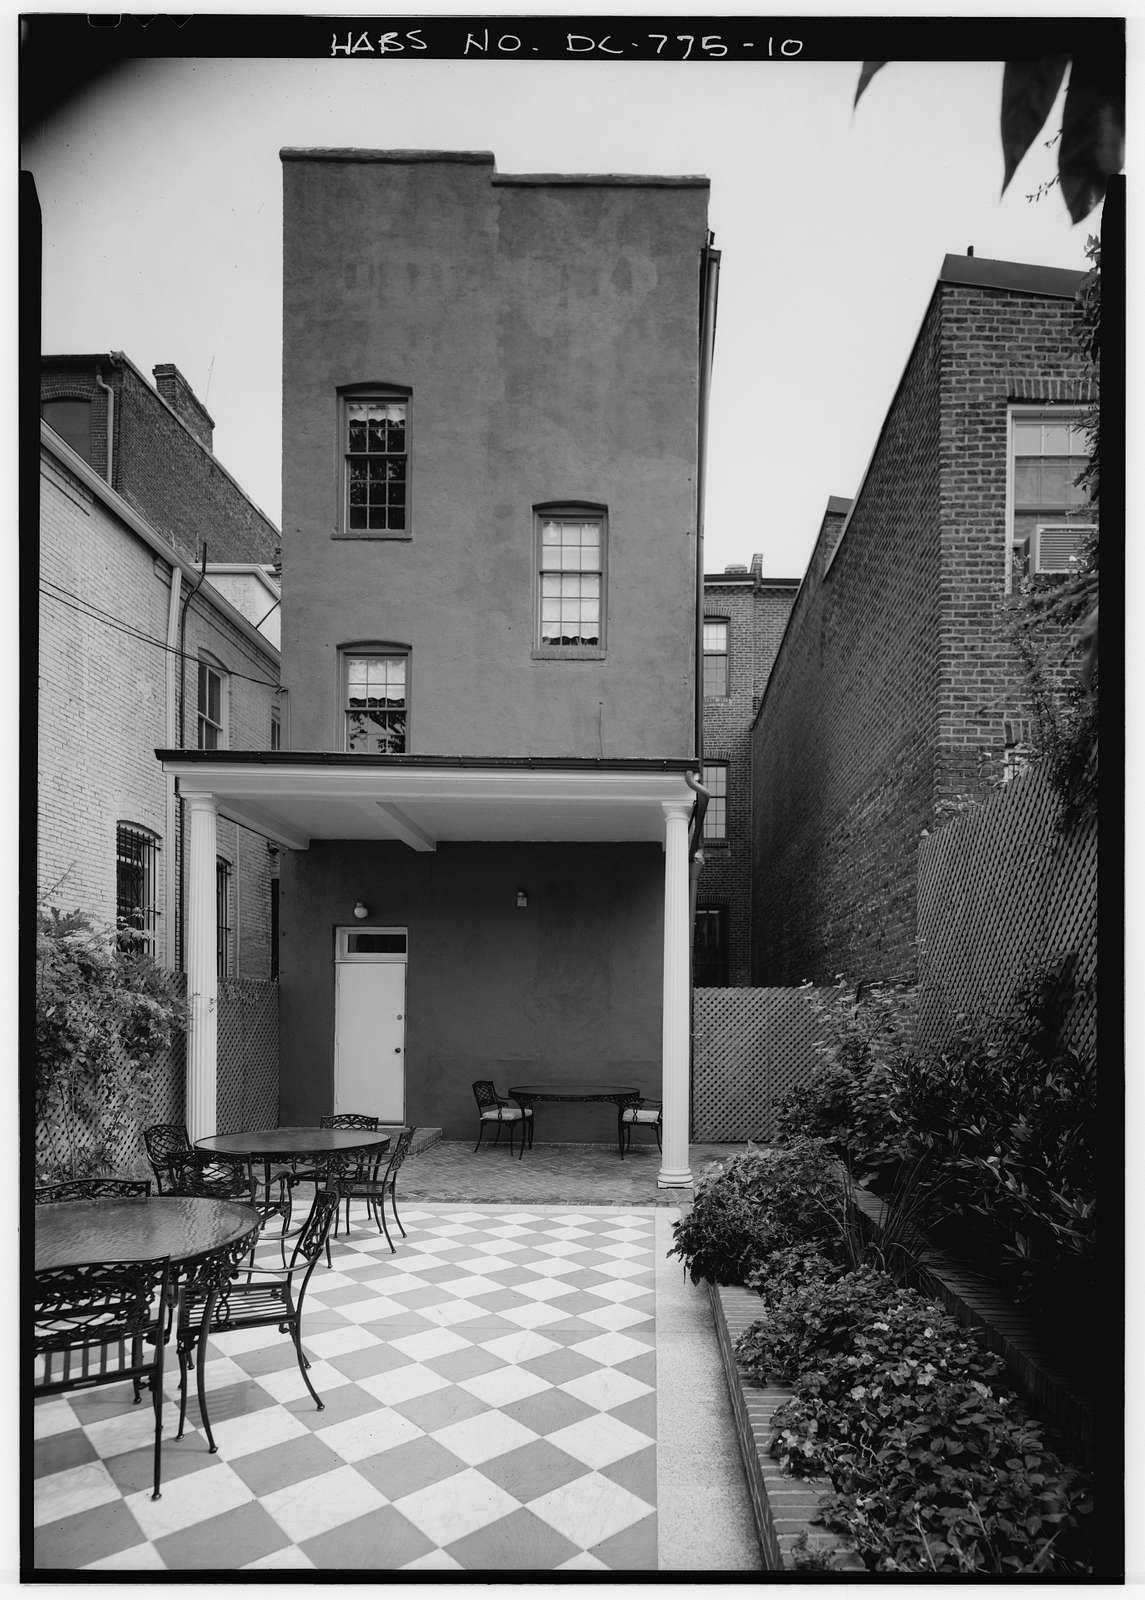 1318 Vermont Avenue, Northwest (House), Washington, District of Columbia, DC